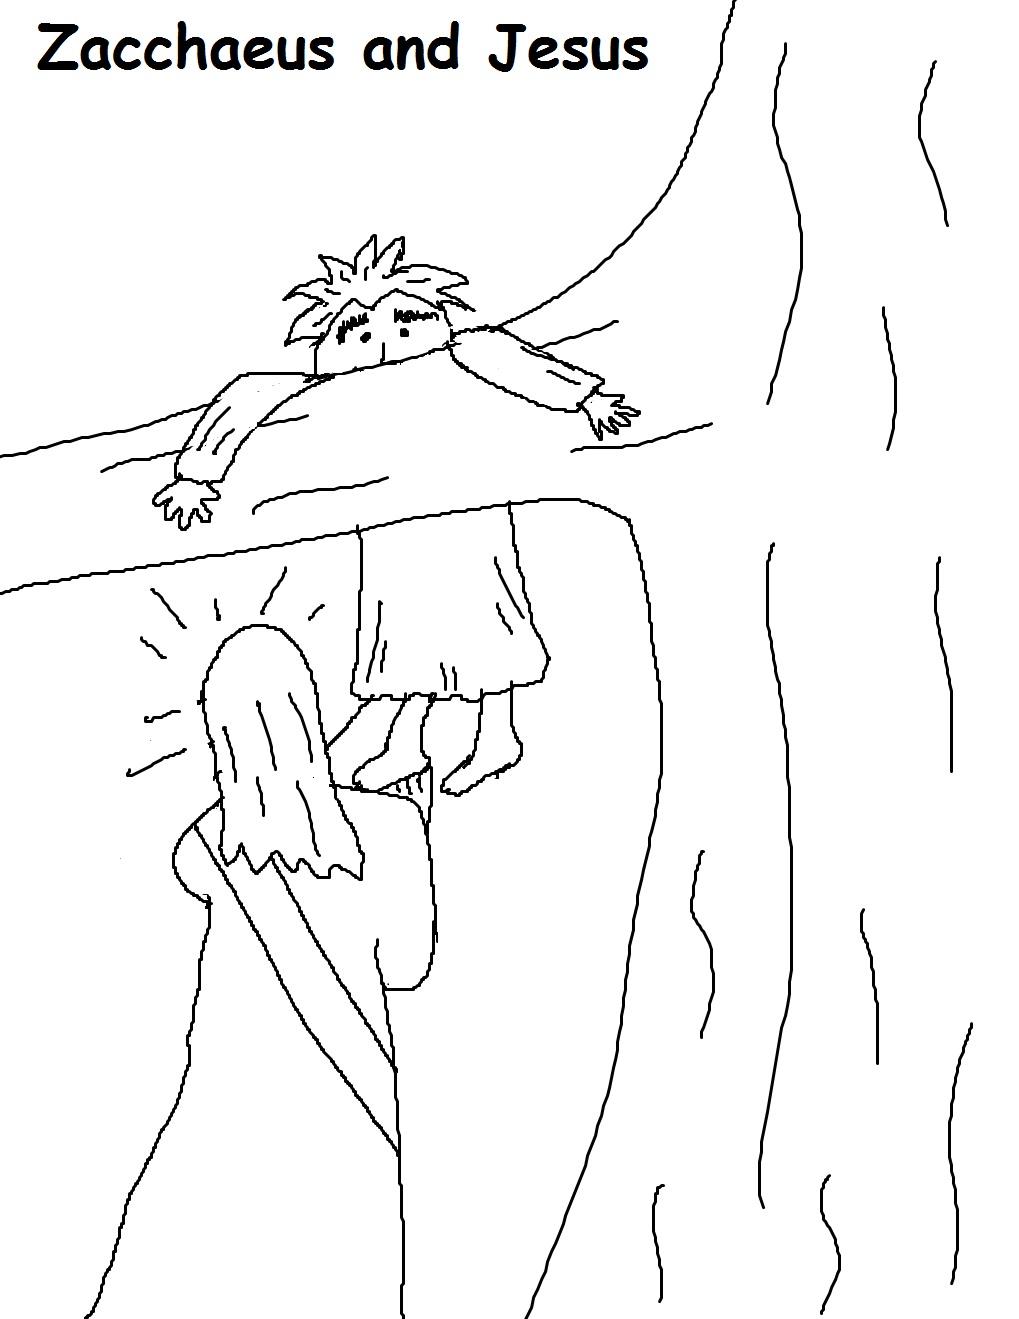 Zacchaeus Sunday School Lesson